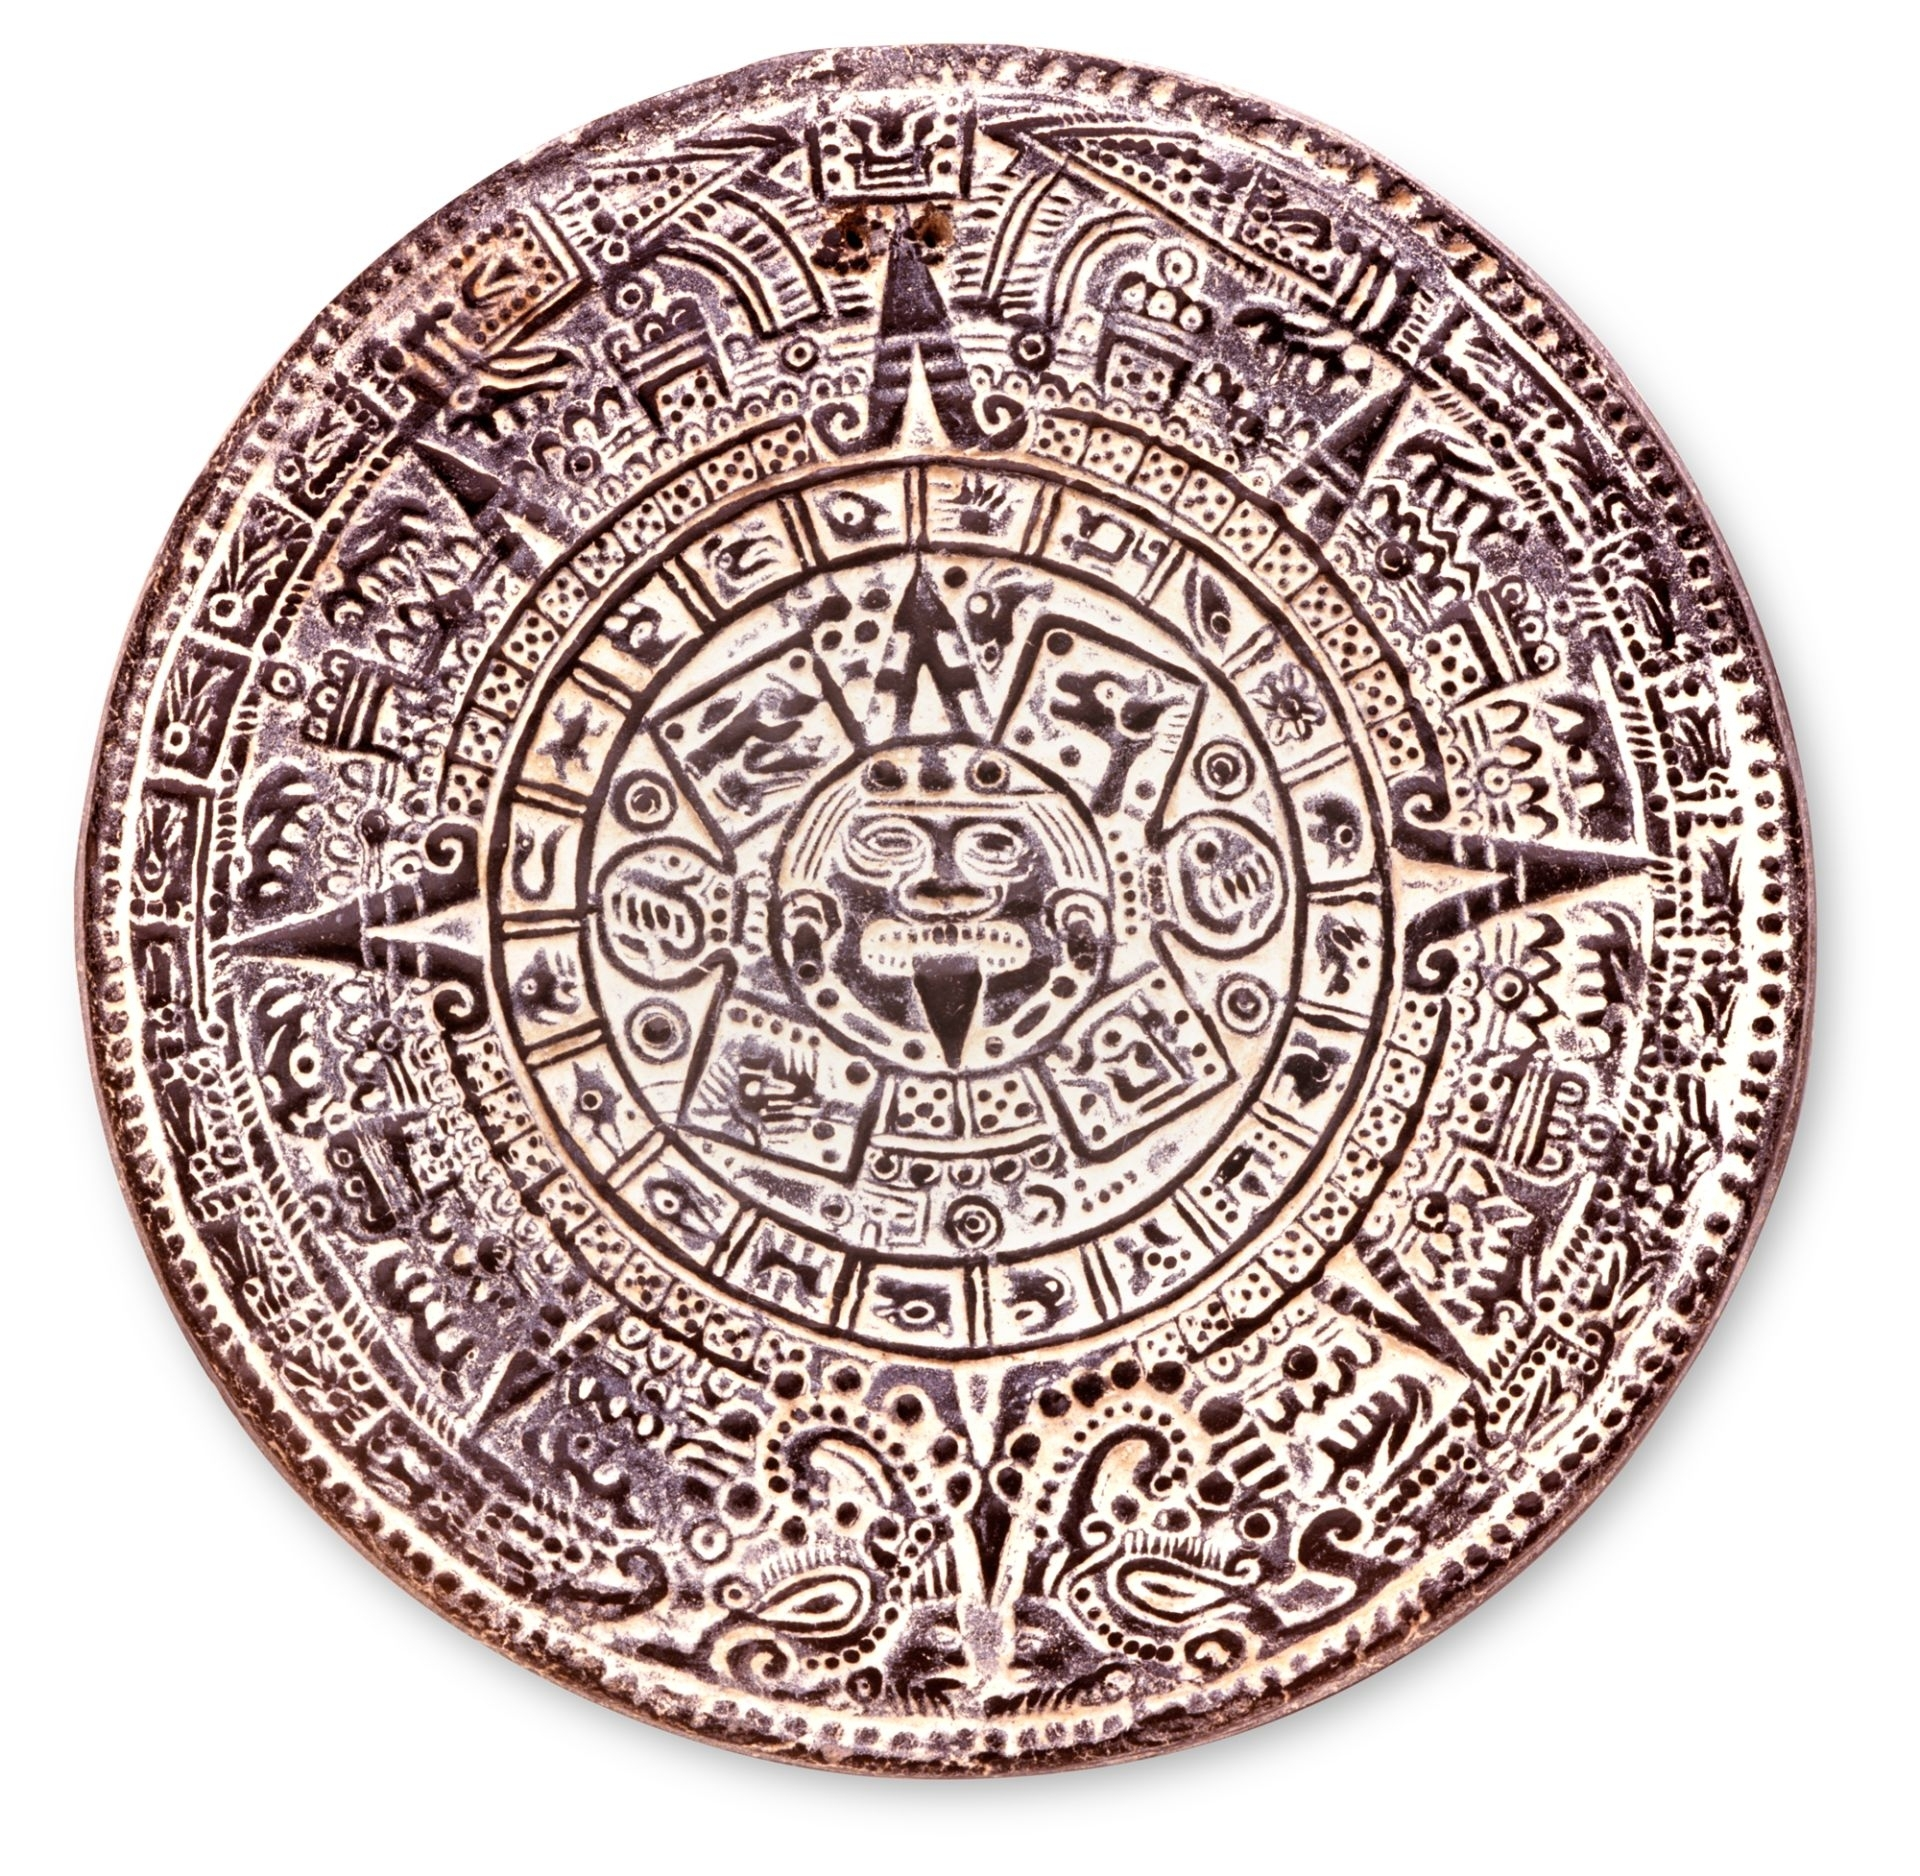 Aztec Calendar Stone   Aztec Calendar Facts   Dk Find Out regarding Aztec Calendar Symbols And Meanings